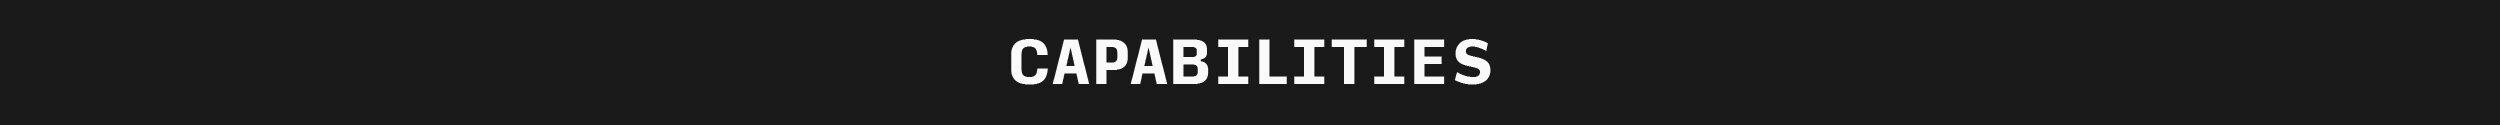 DLP_About_Logos(Capabilities).jpg